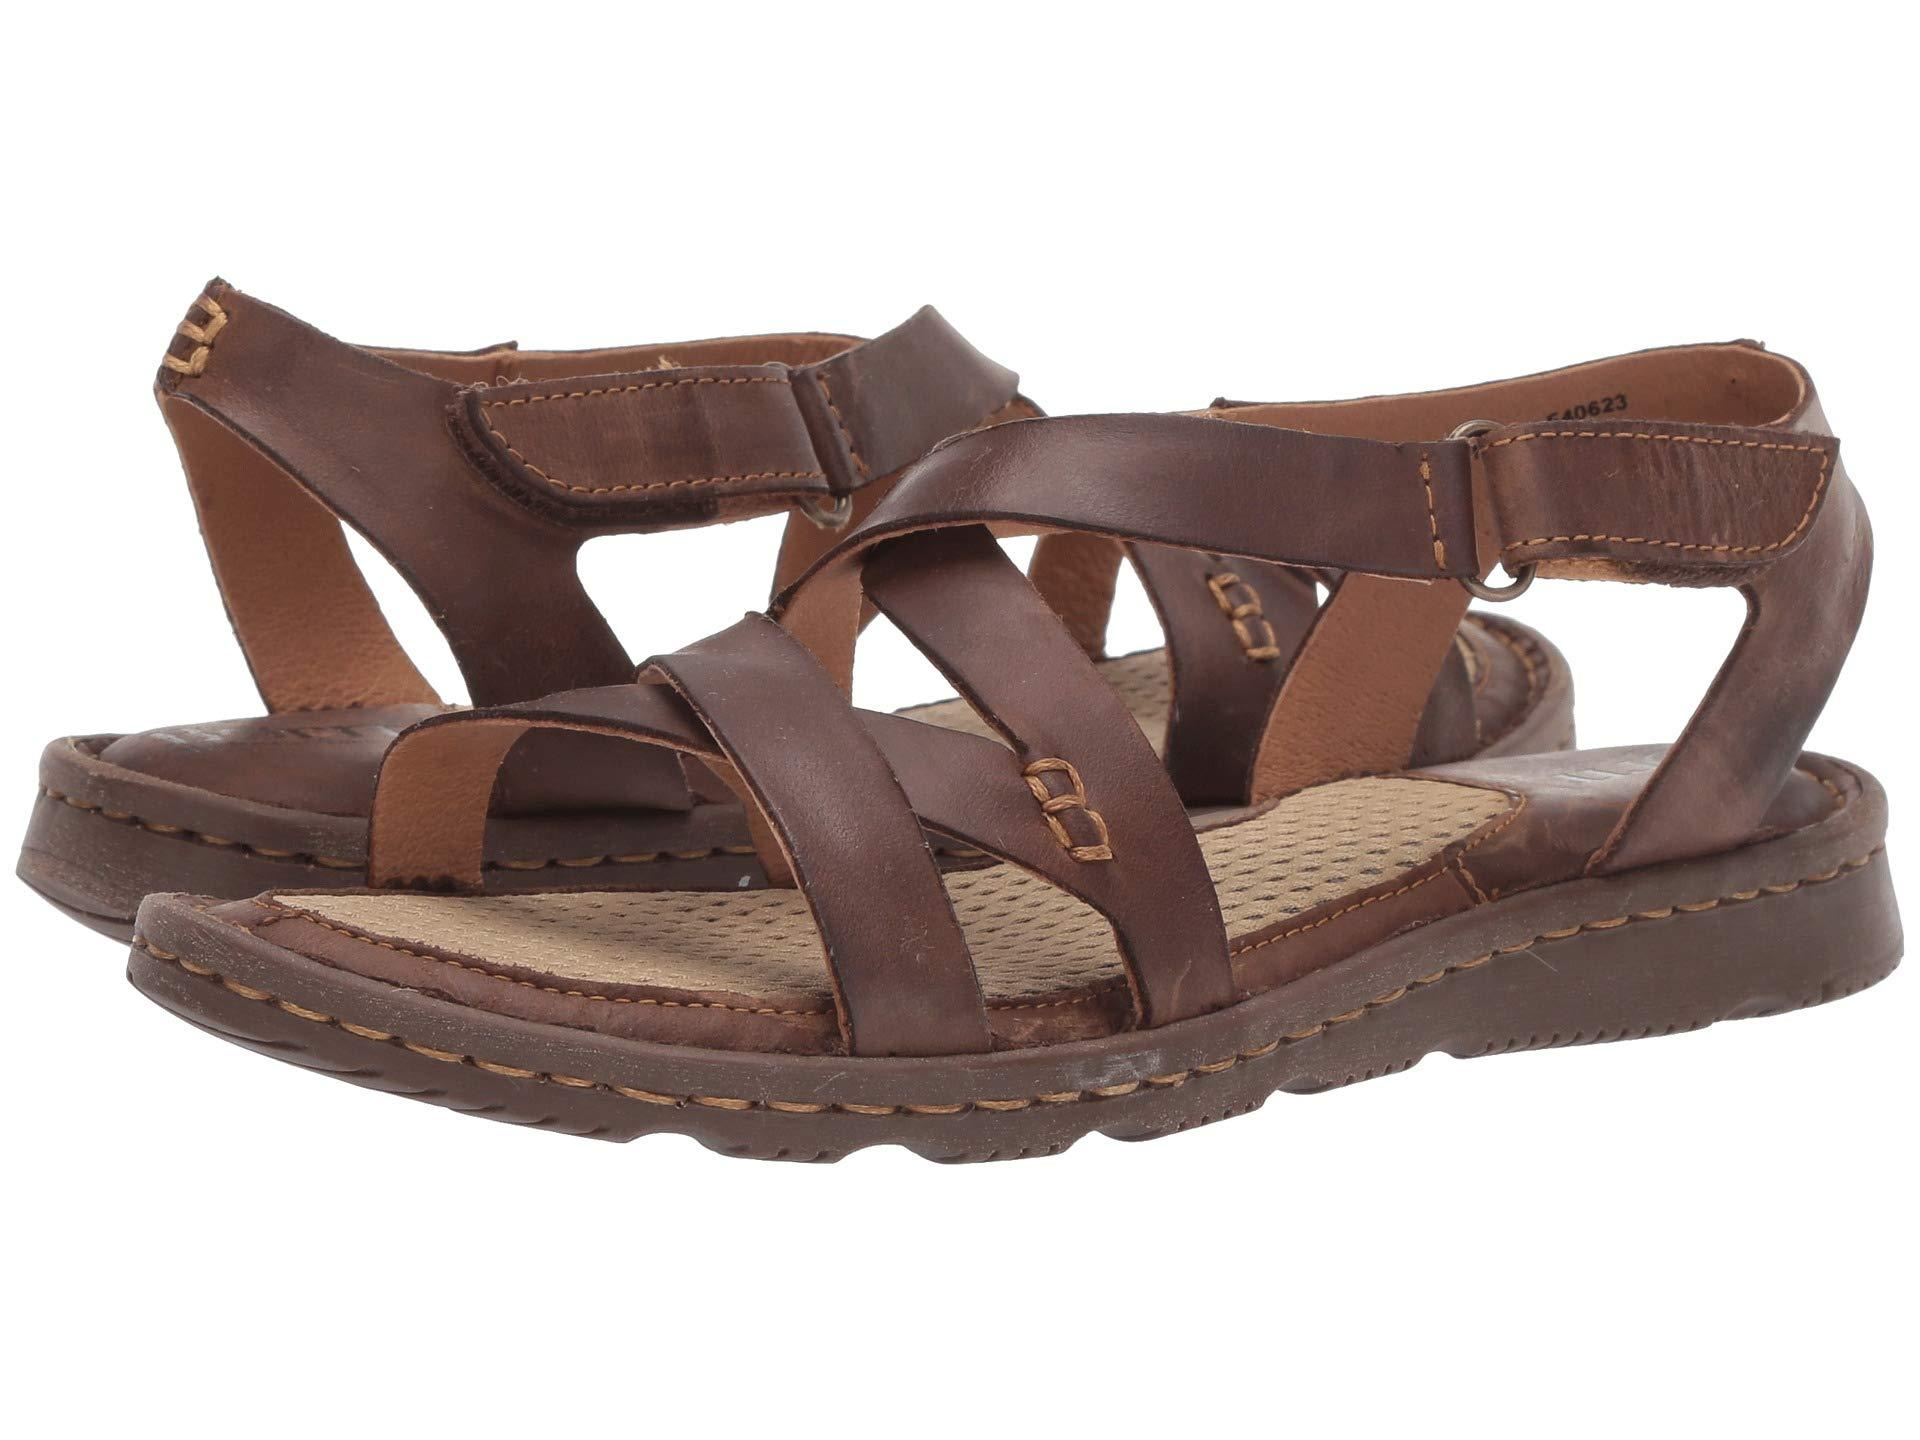 e95c4b421 Born - Trinidad (dark Brown Full Grain Leather) Women s Sandals - Lyst.  View fullscreen